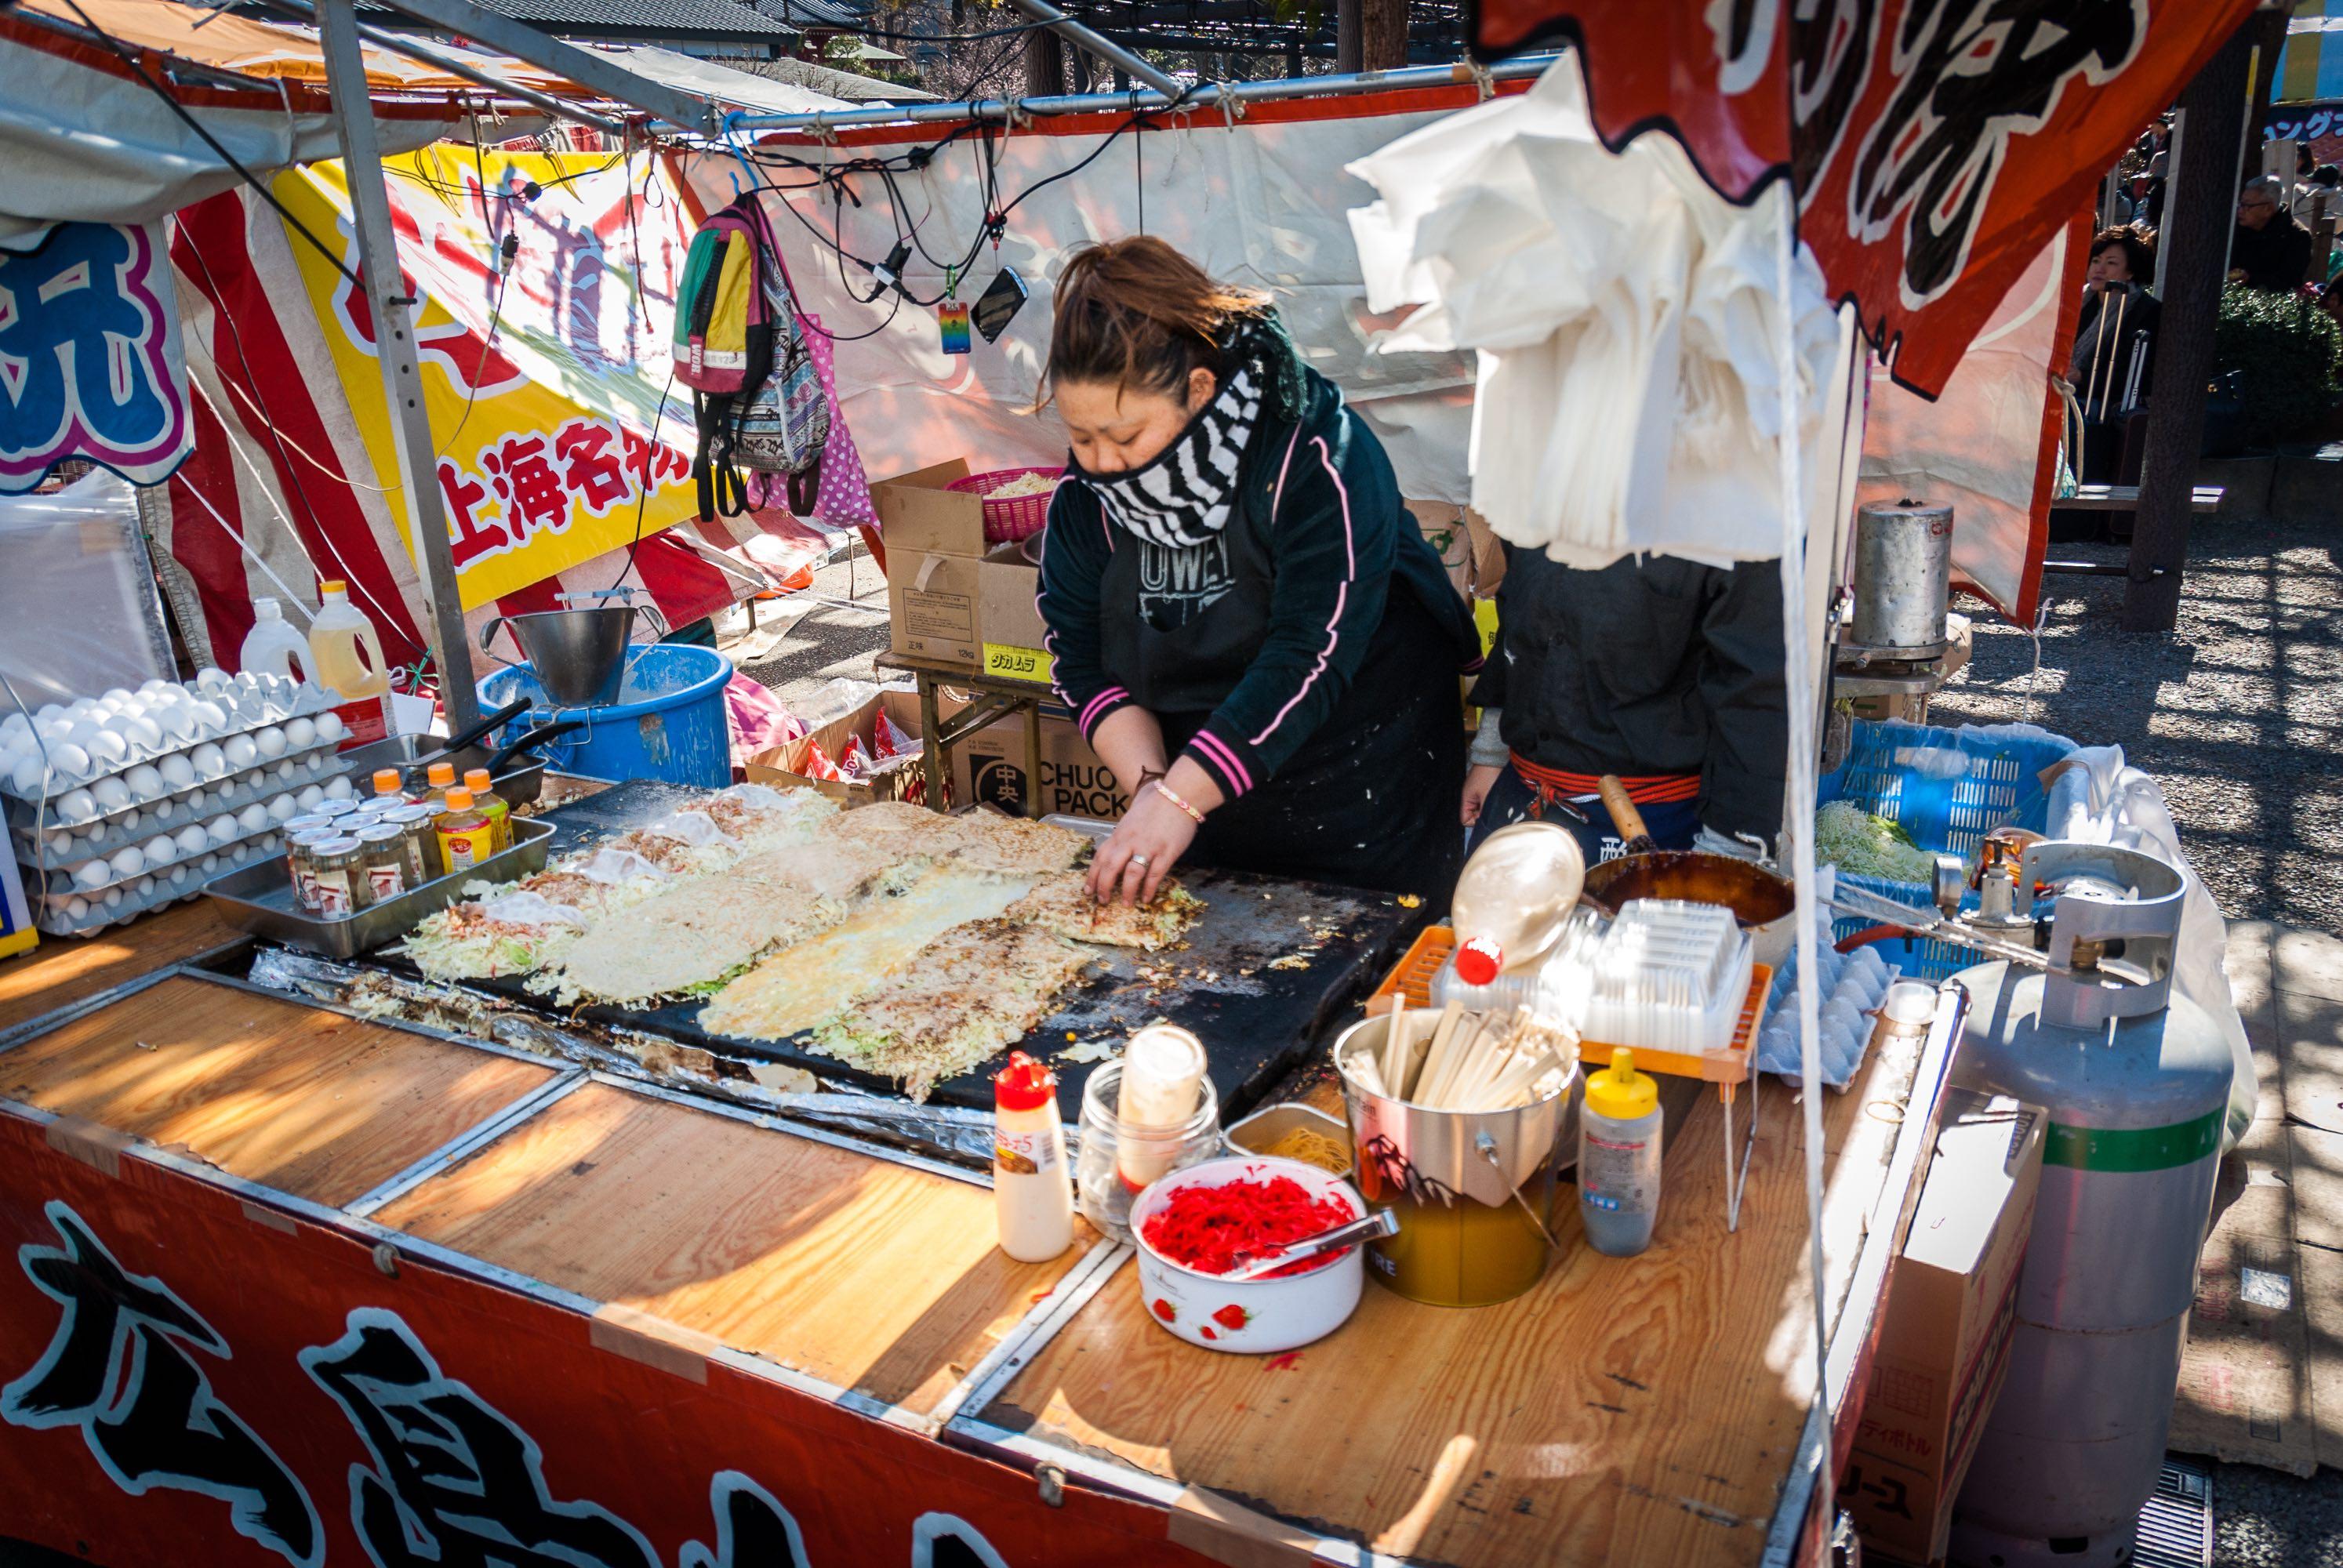 Japanese woman making okonimiyaki